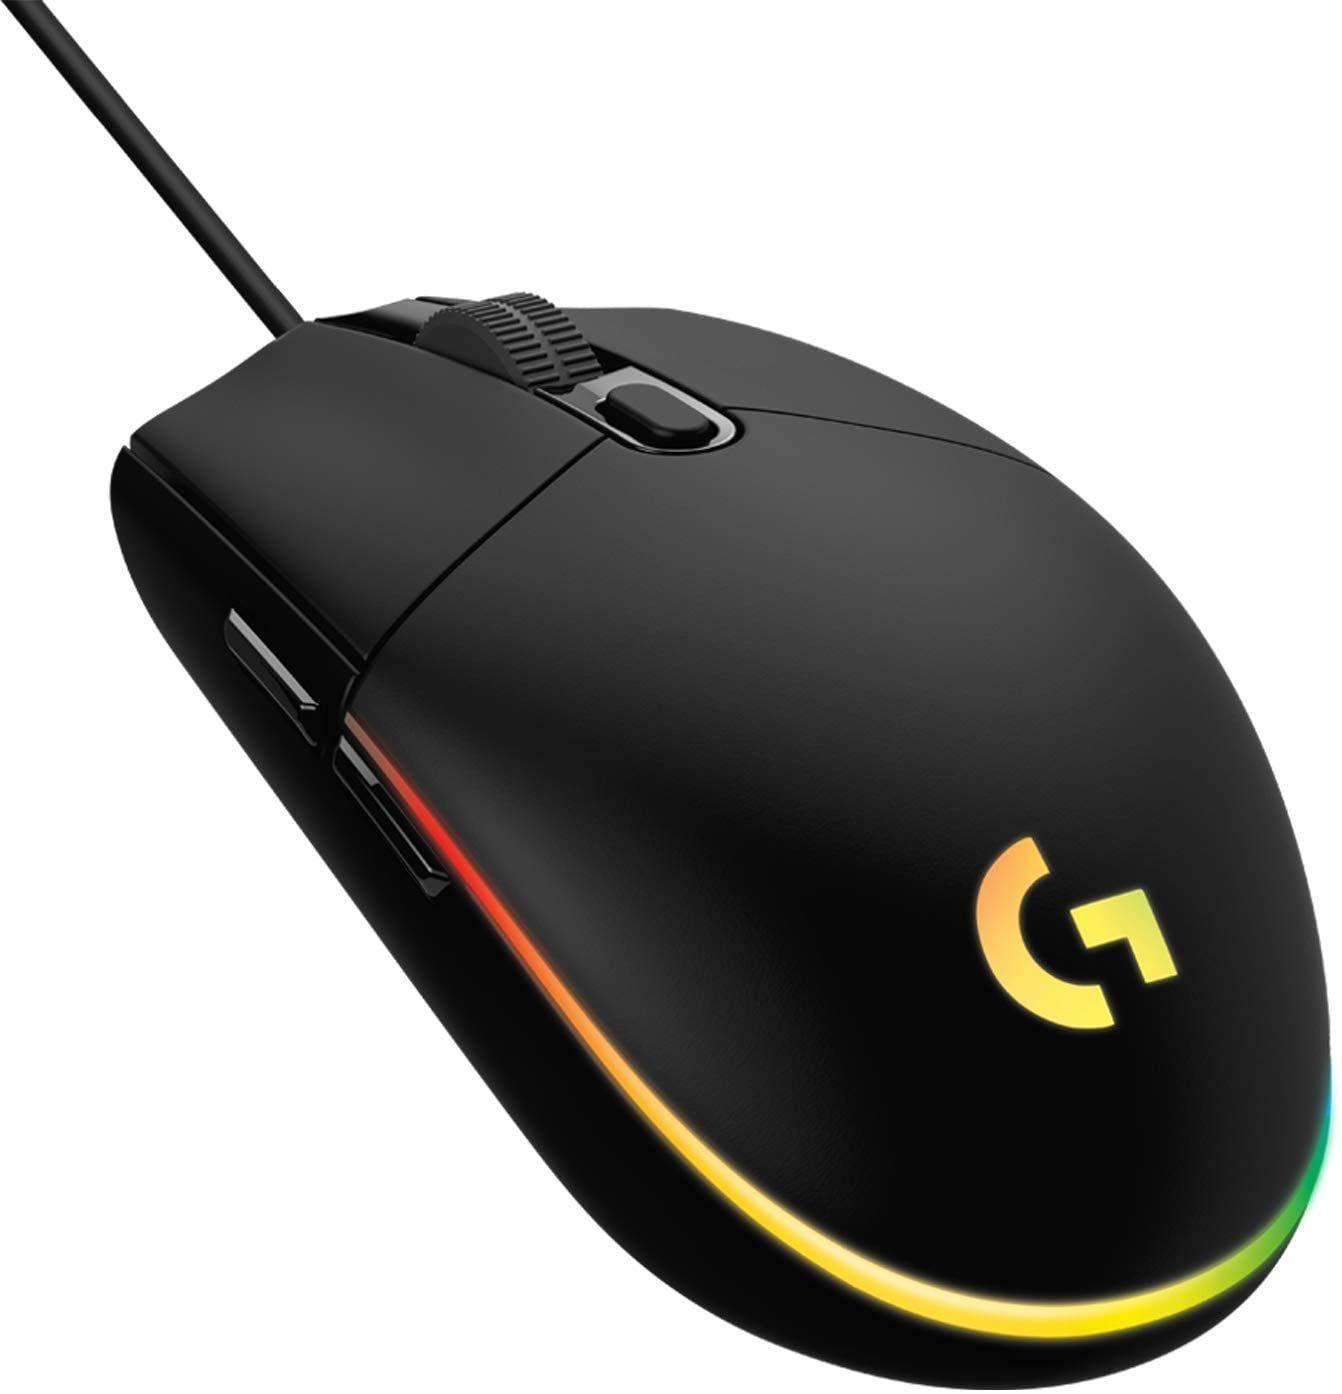 Logitech g203 lightsync mouse gaming con illuminazione rgb